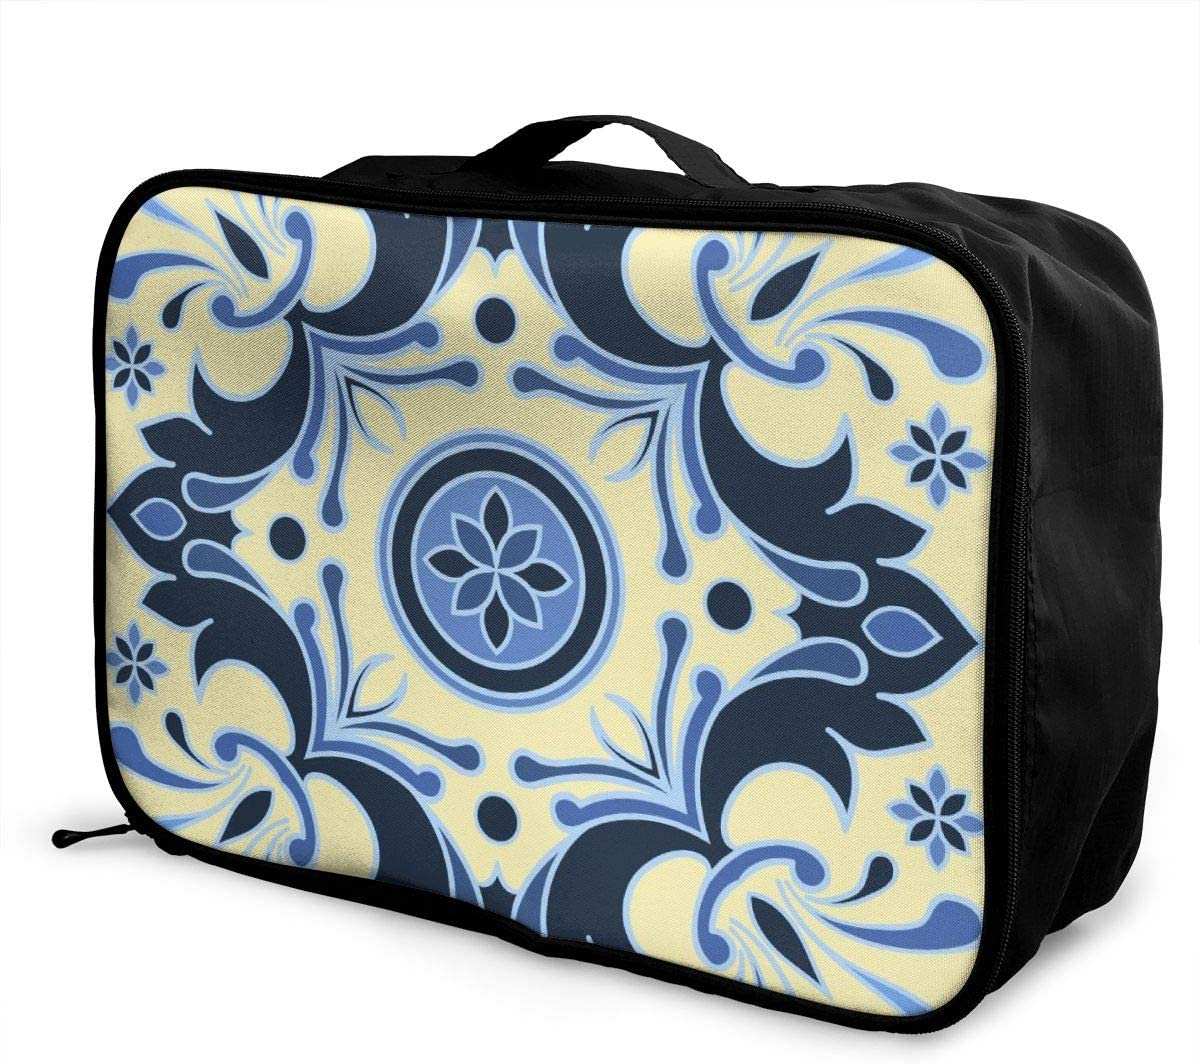 Yunshm Blue And Yellow Tile Style Italian Enamel Style Design Personalized Trolley Handbag Waterproof Unisex Large Capacity For Business Travel Storage